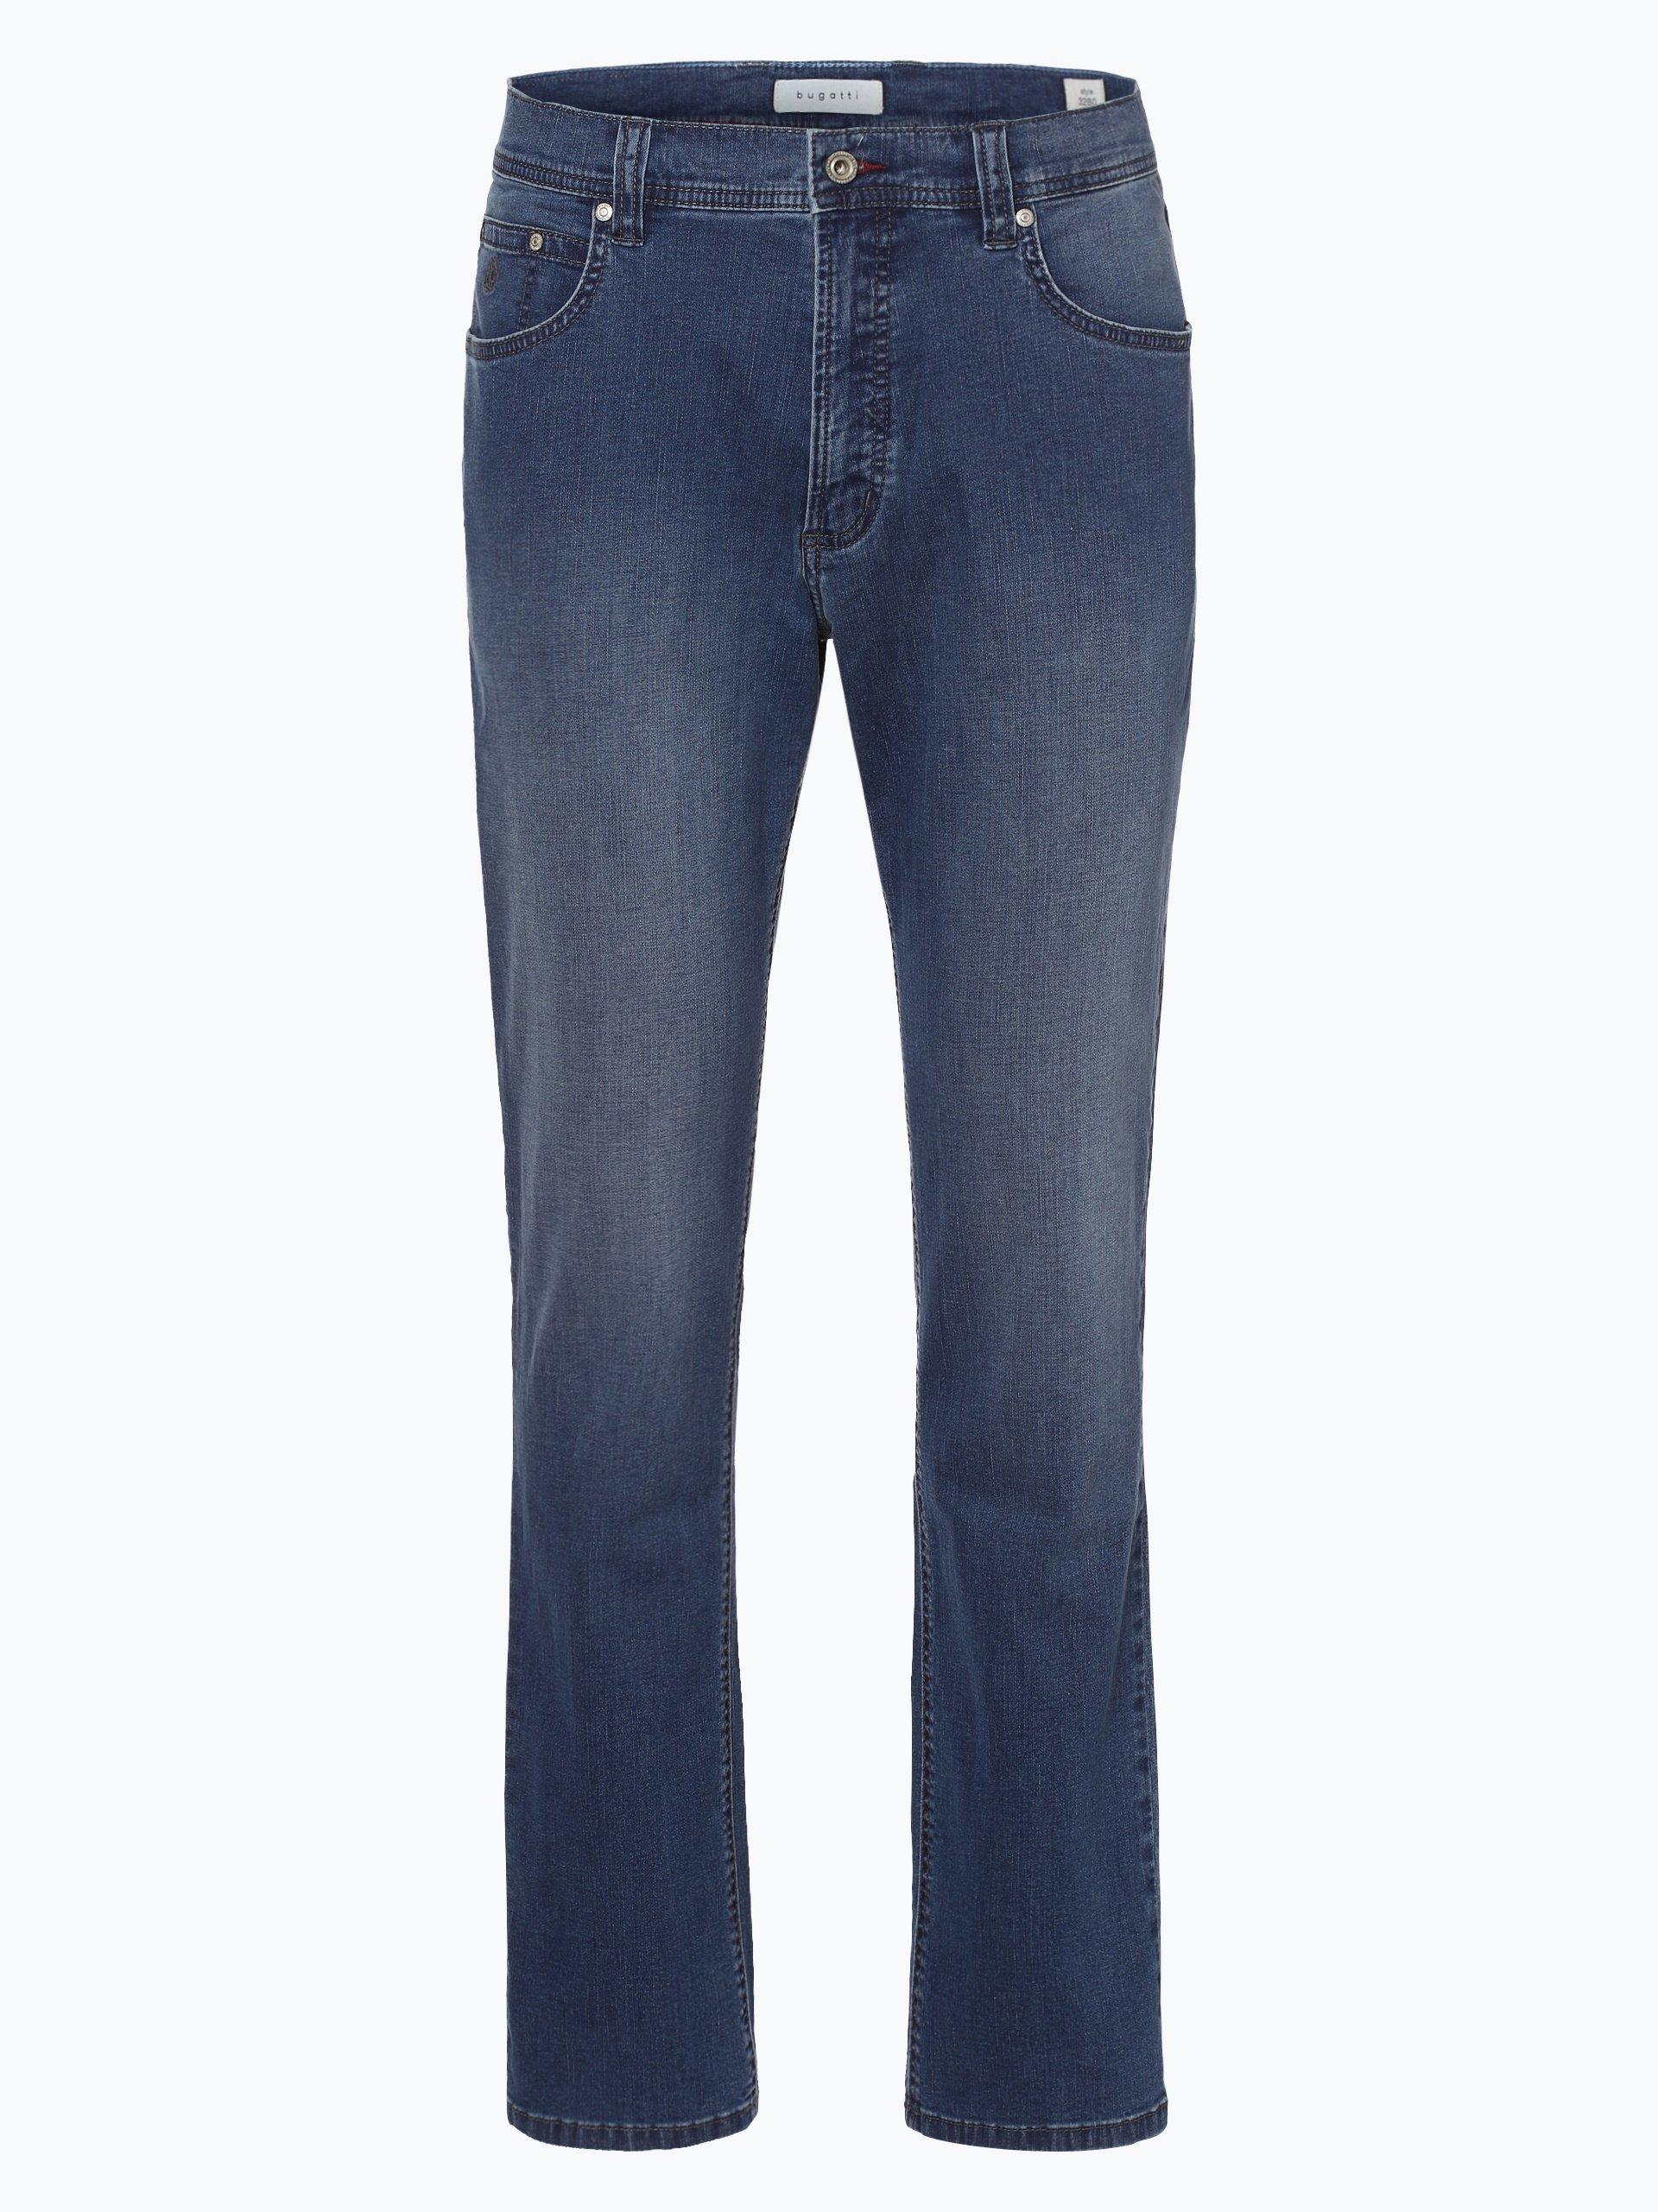 Bugatti Herren Jeans - 3280